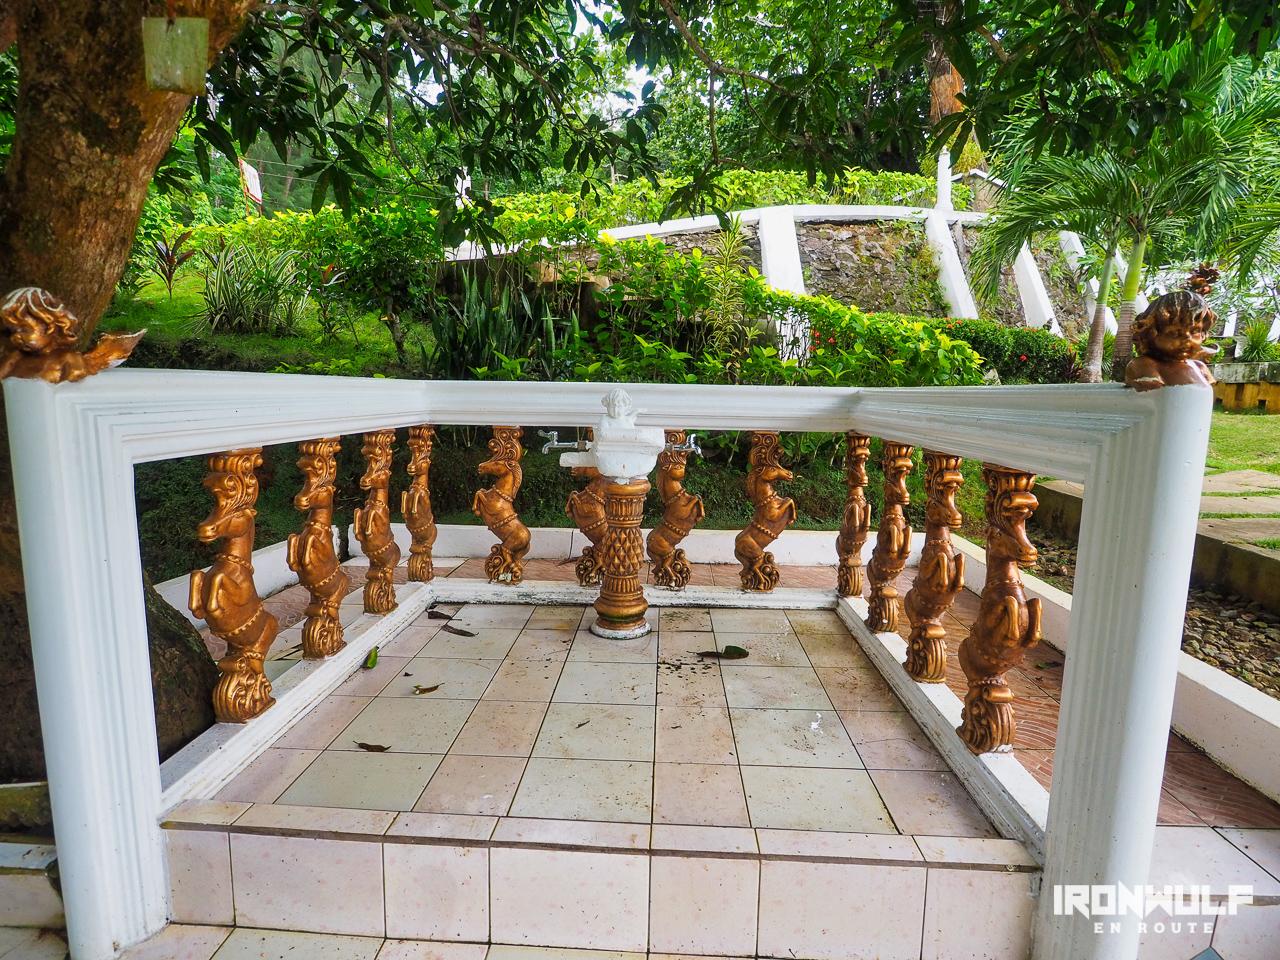 A foot bathing area (?)